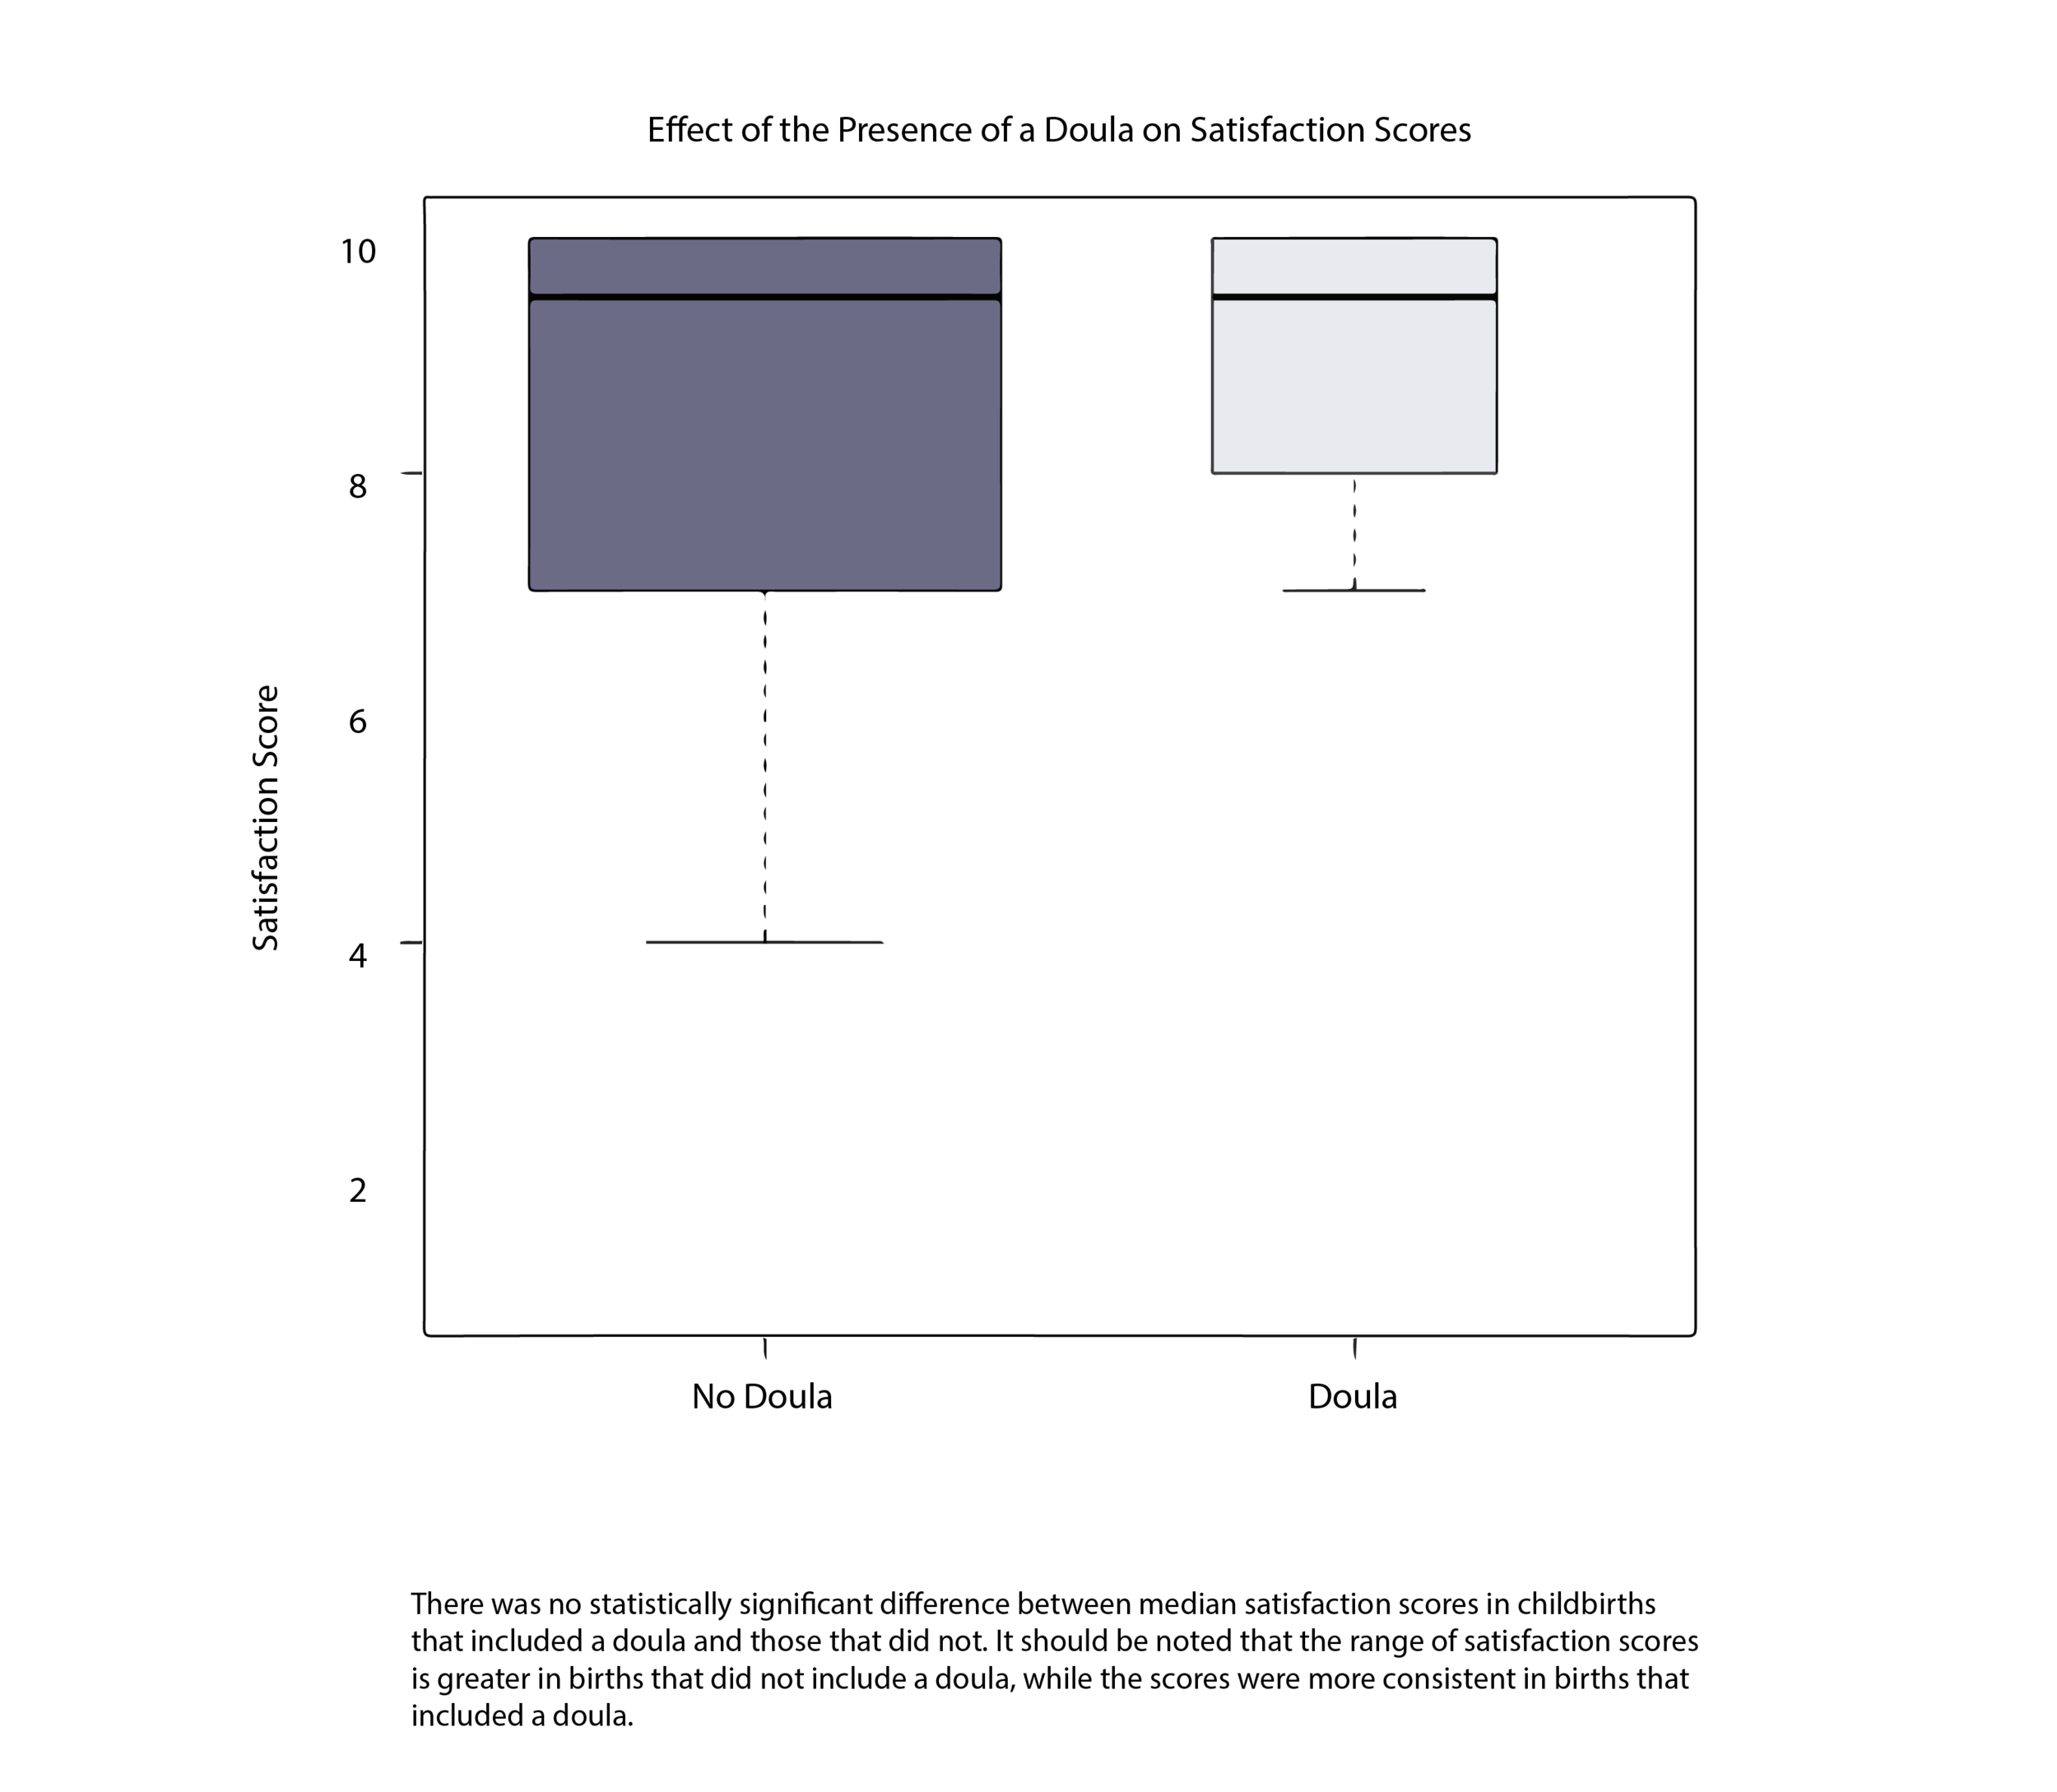 graphArtboard 8@4x.png